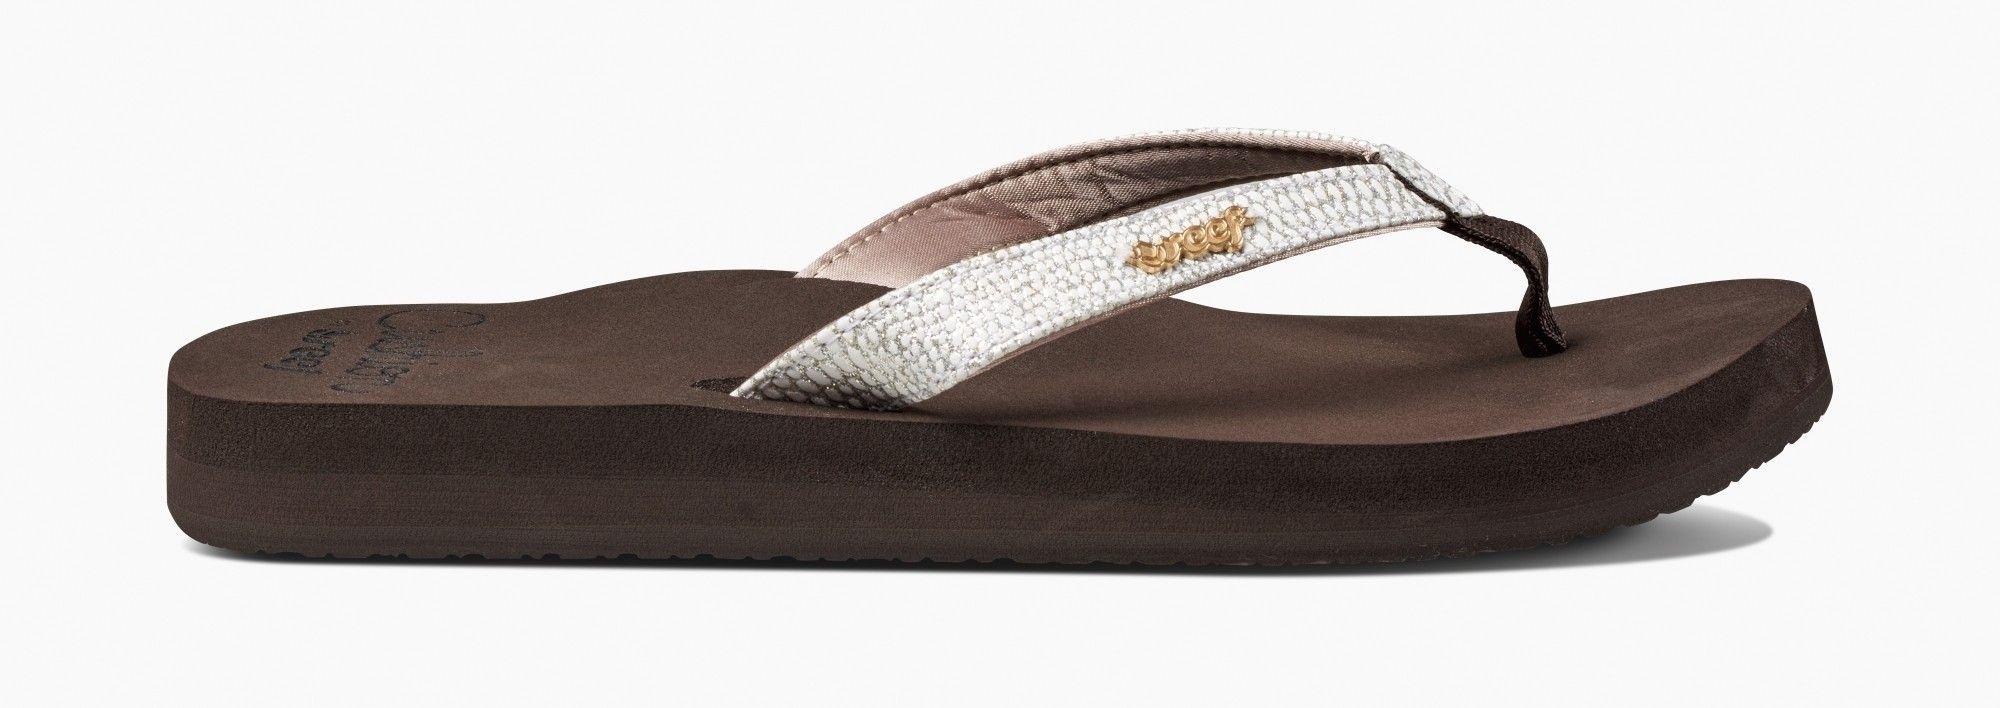 Reef dames slipper Star Cushion Sassy